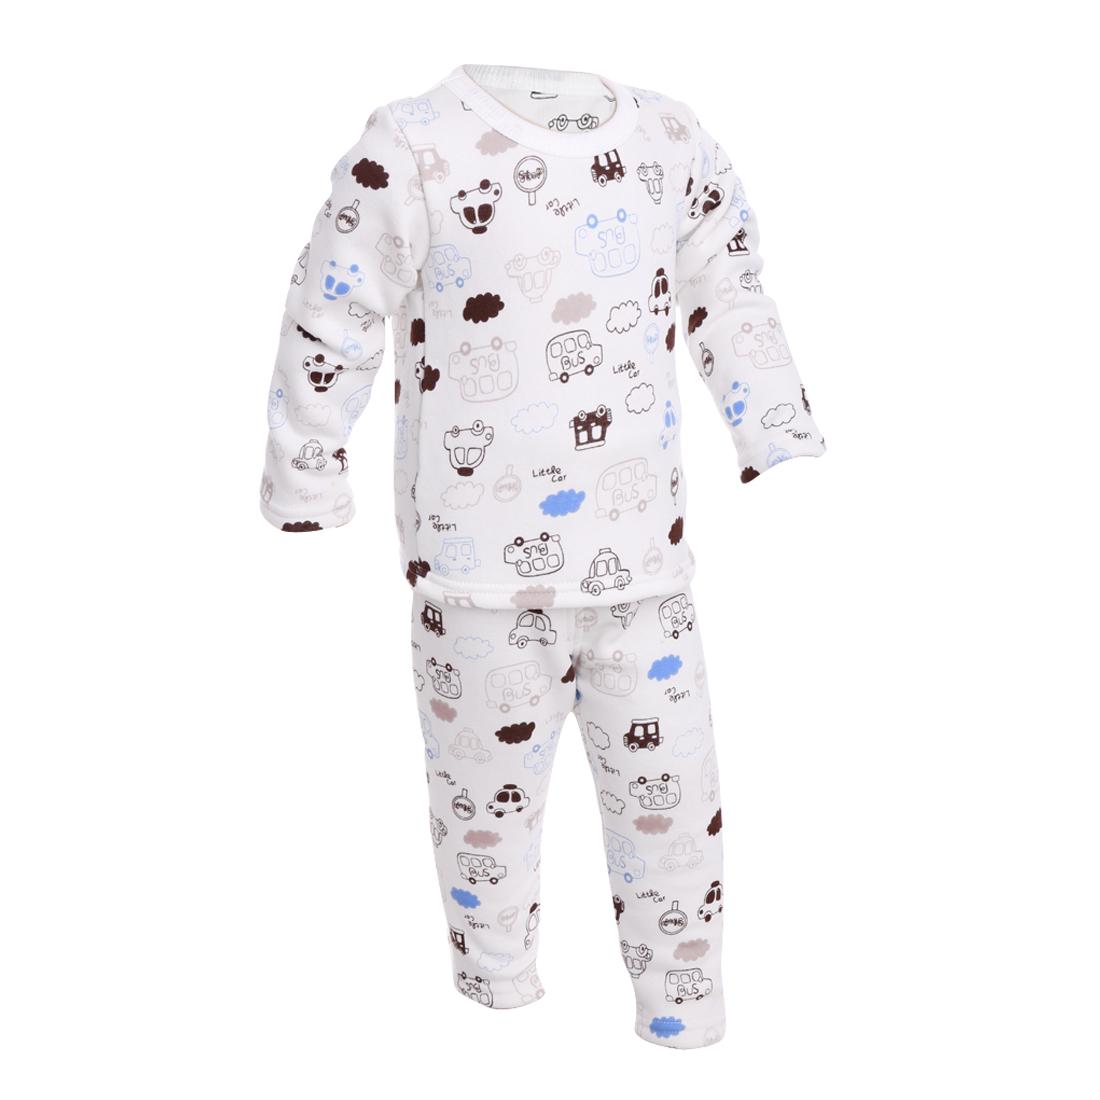 Child Tee Stretch Pants Car Prints White Pajama Sets 3T